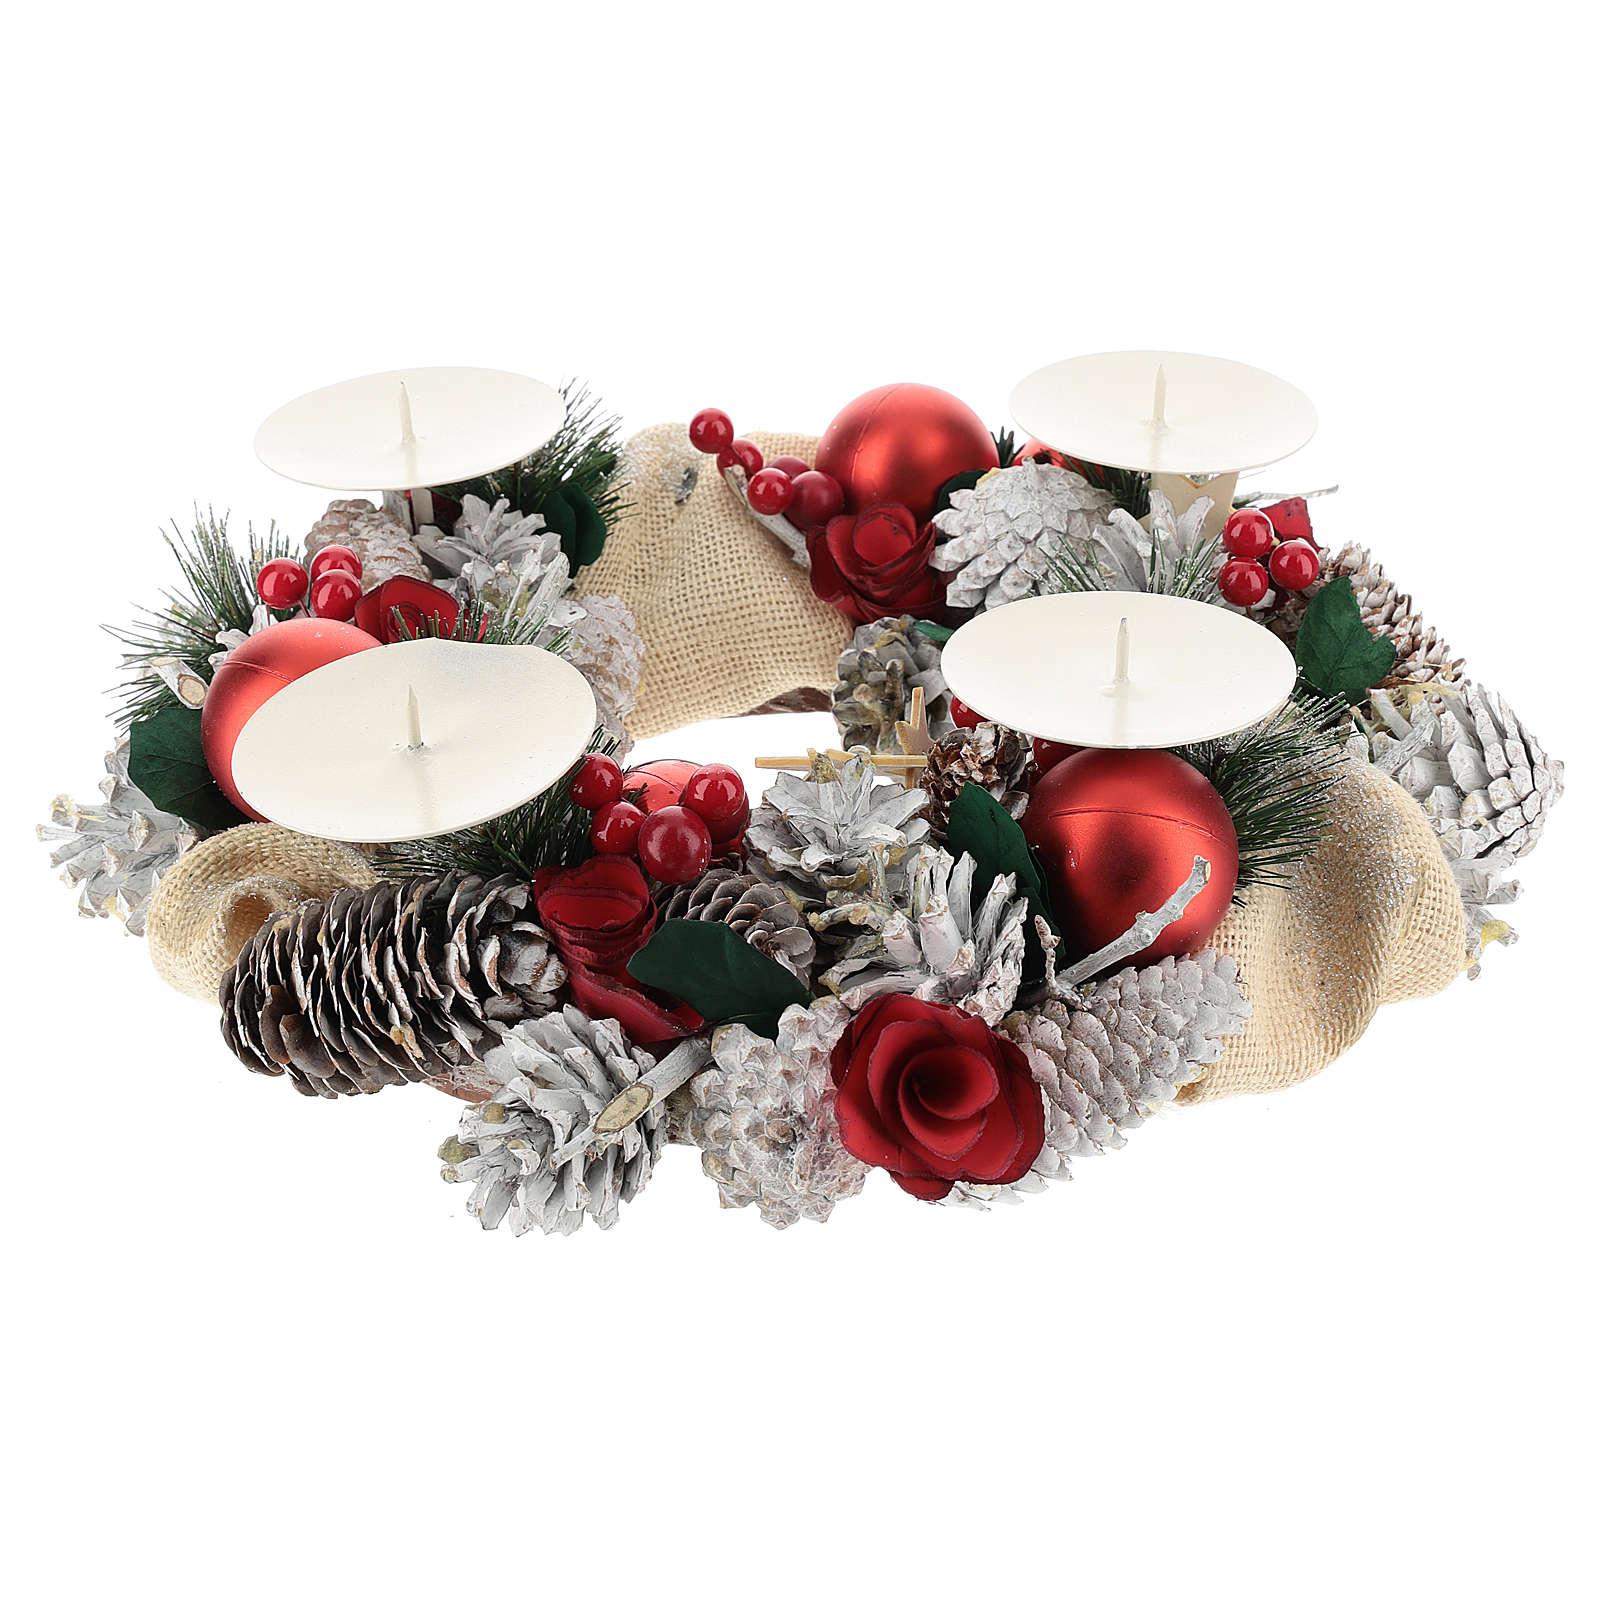 Kit Advento coroa Natal nevada bagas vermelhas pinos brancos velas vermelhas 3